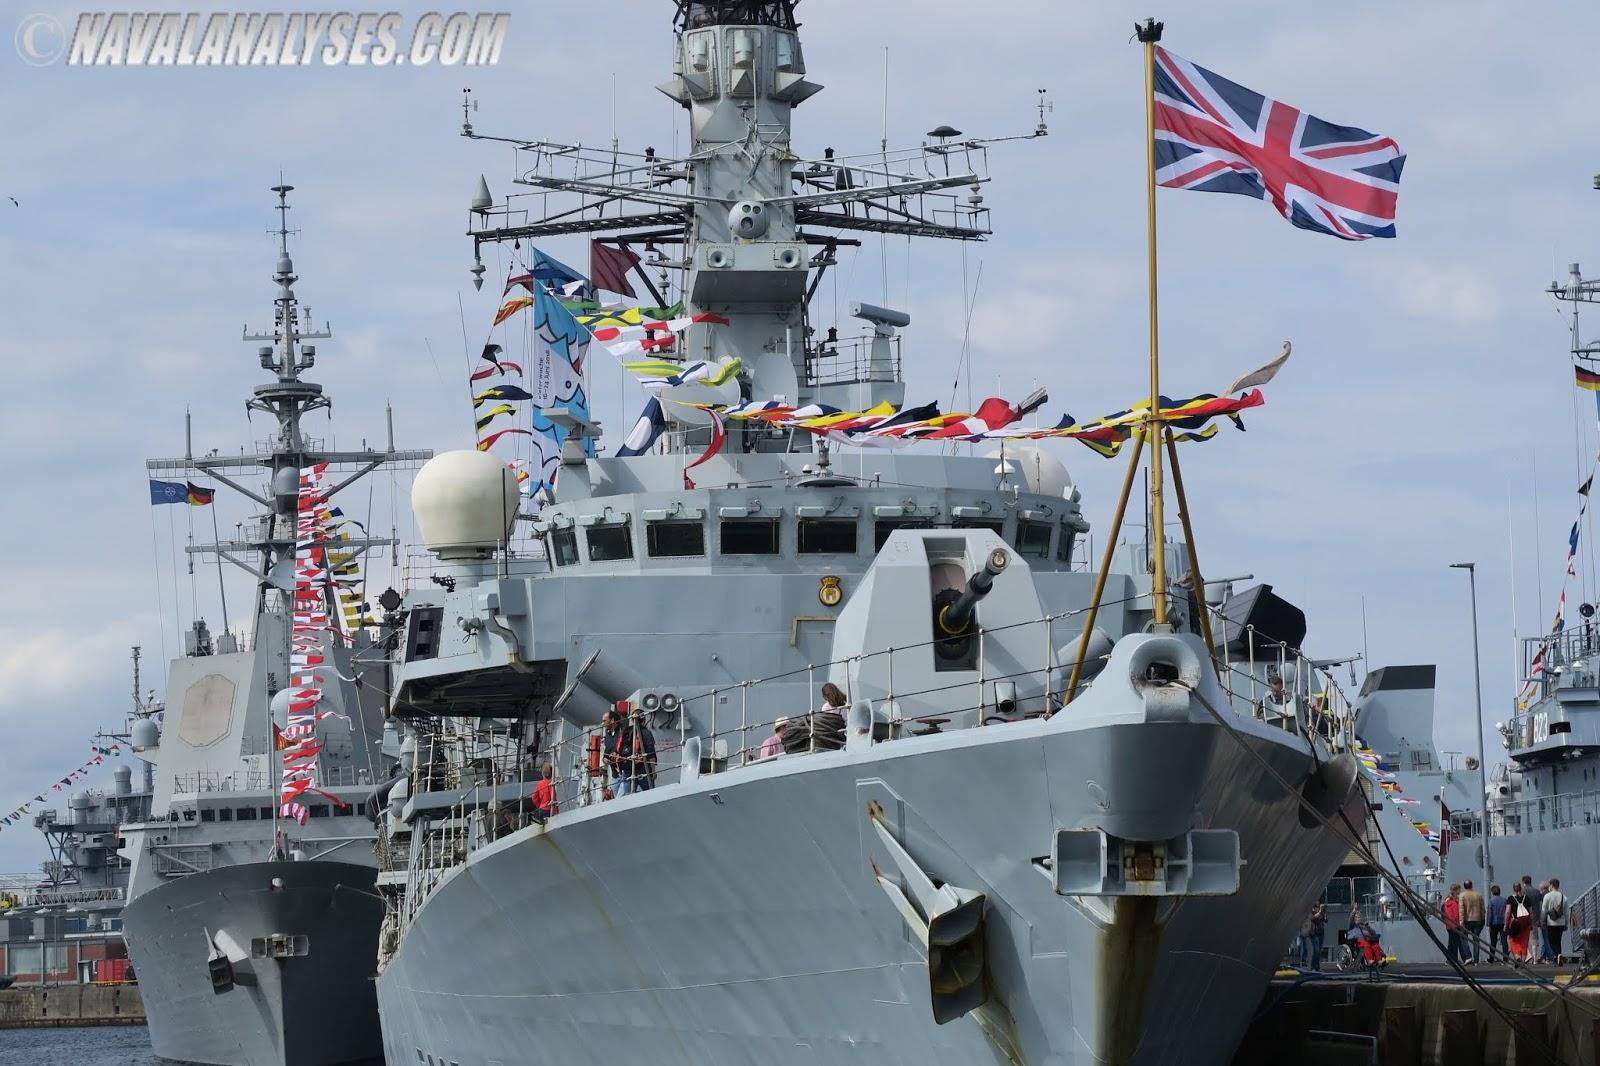 Minelaying Royal Navy (1976)